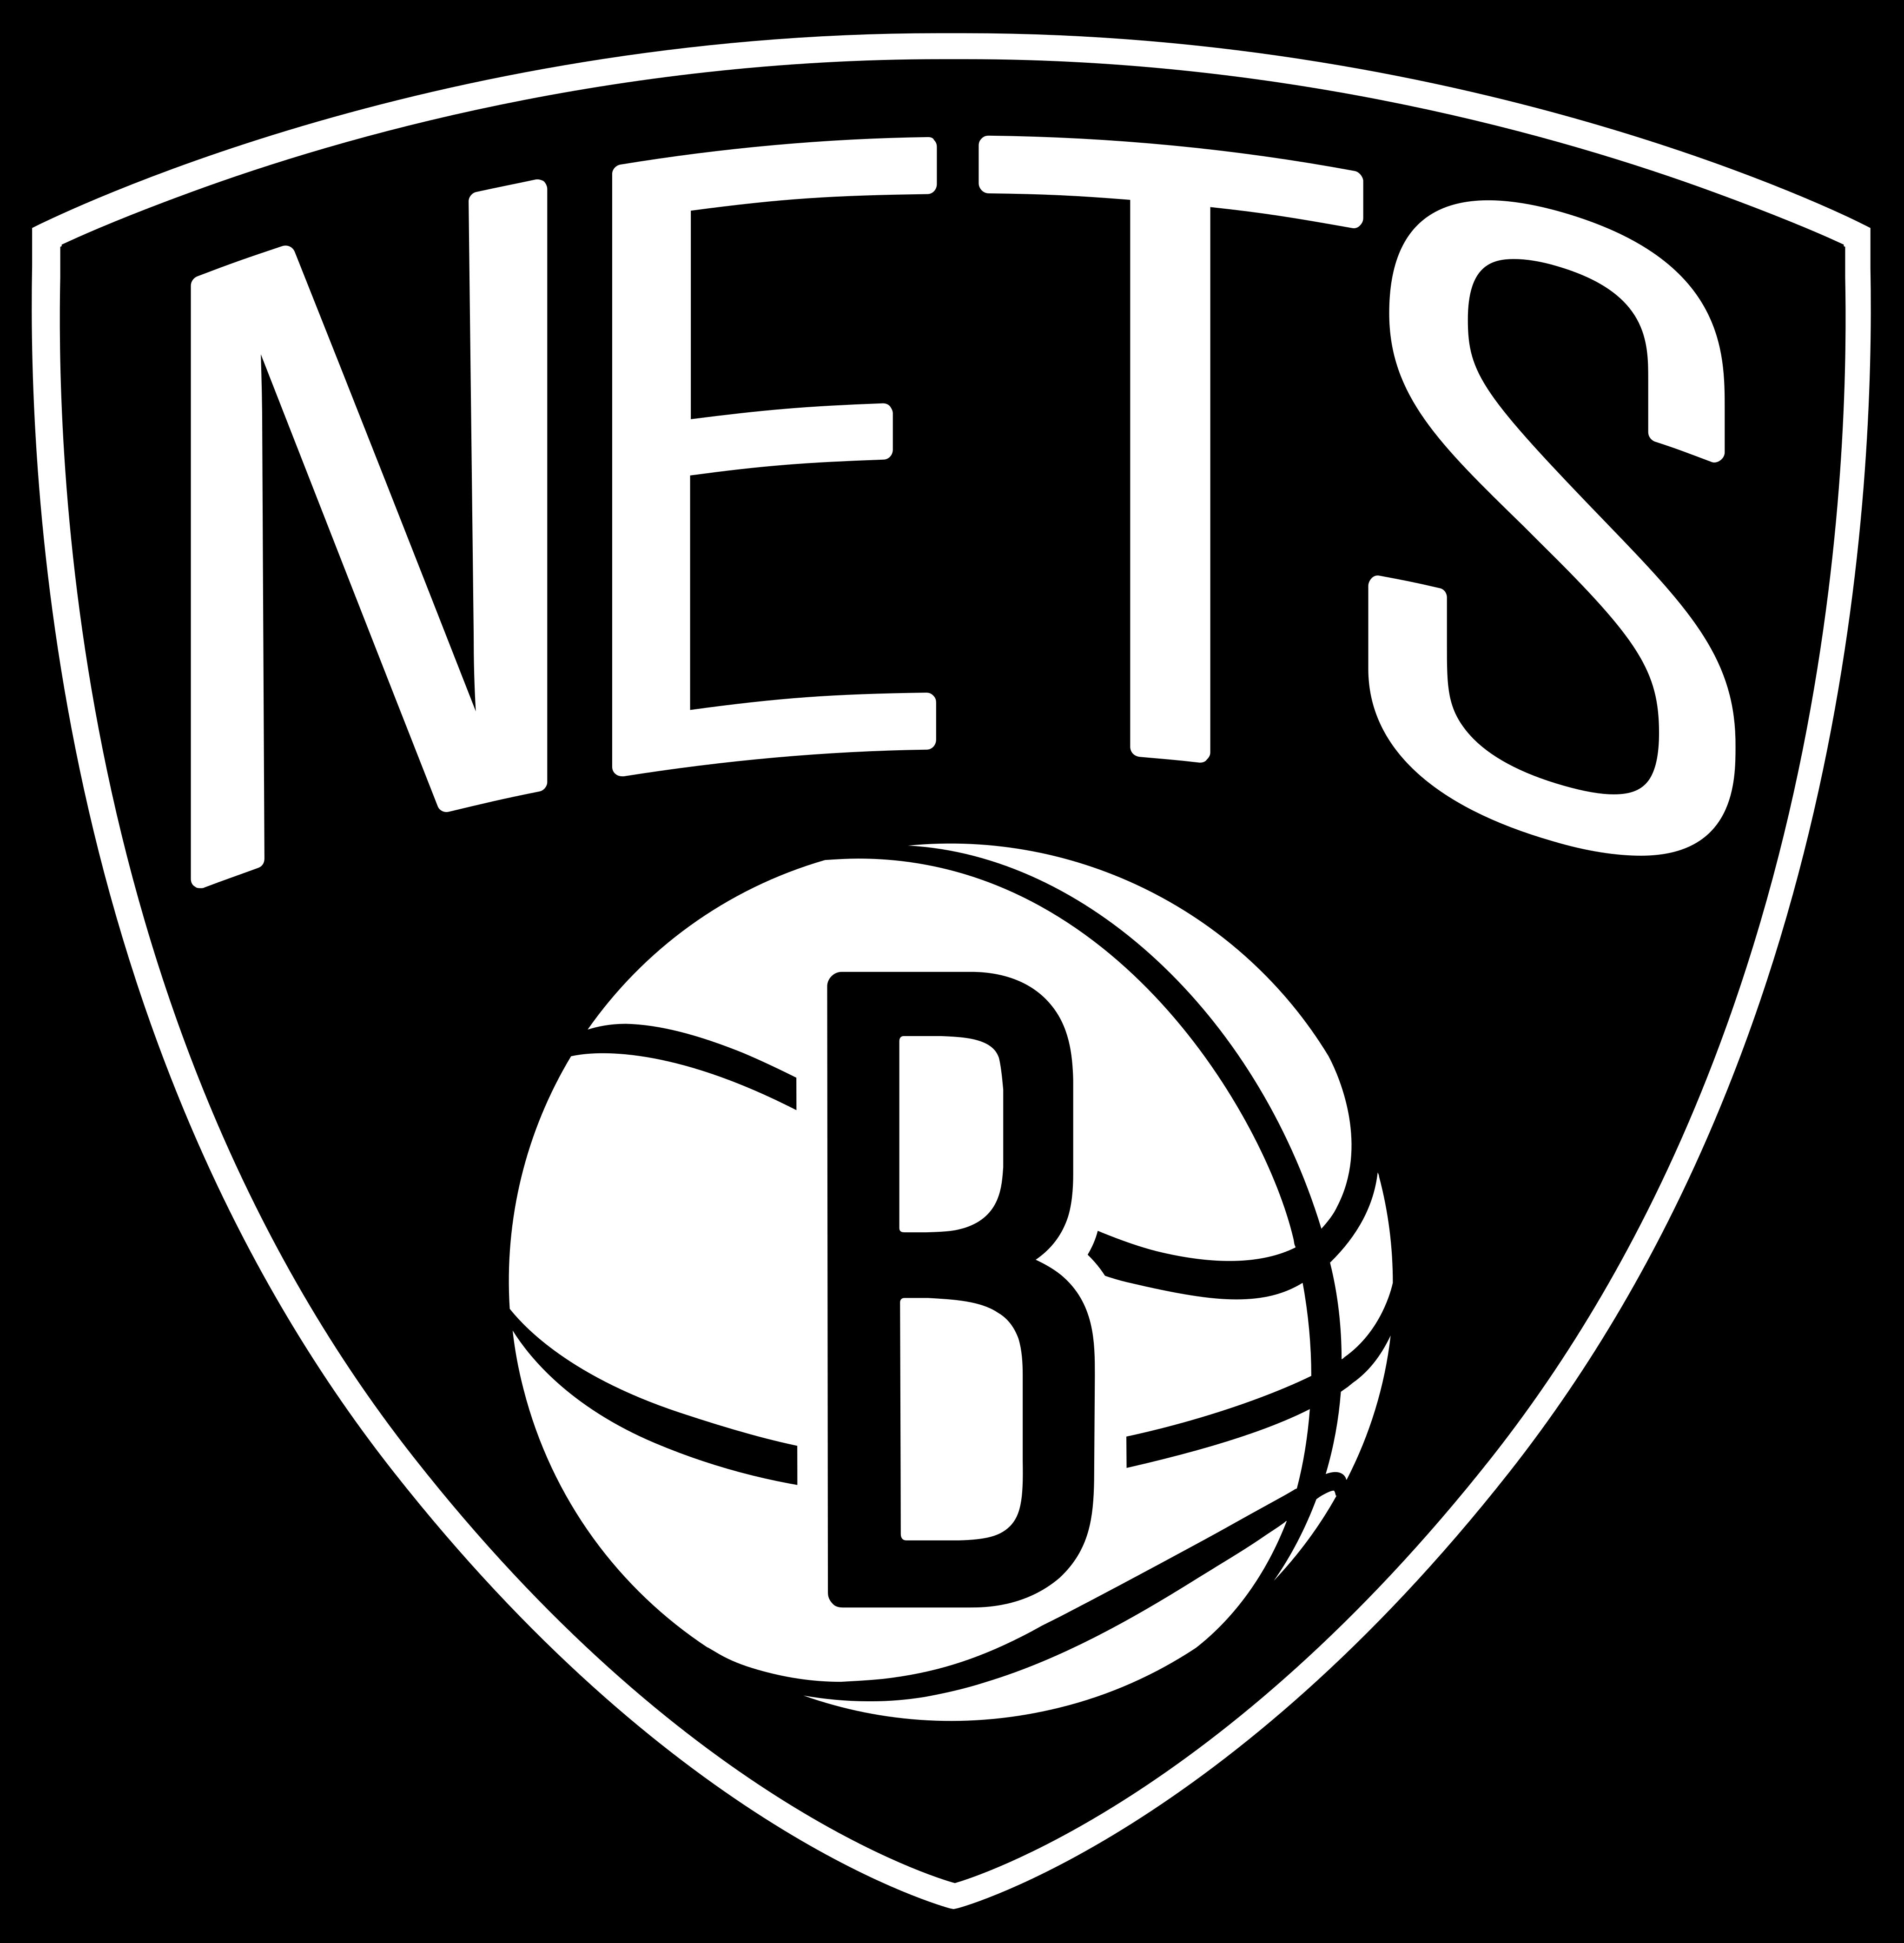 brooklyn nets logo 2 - Brooklyn Nets Logo